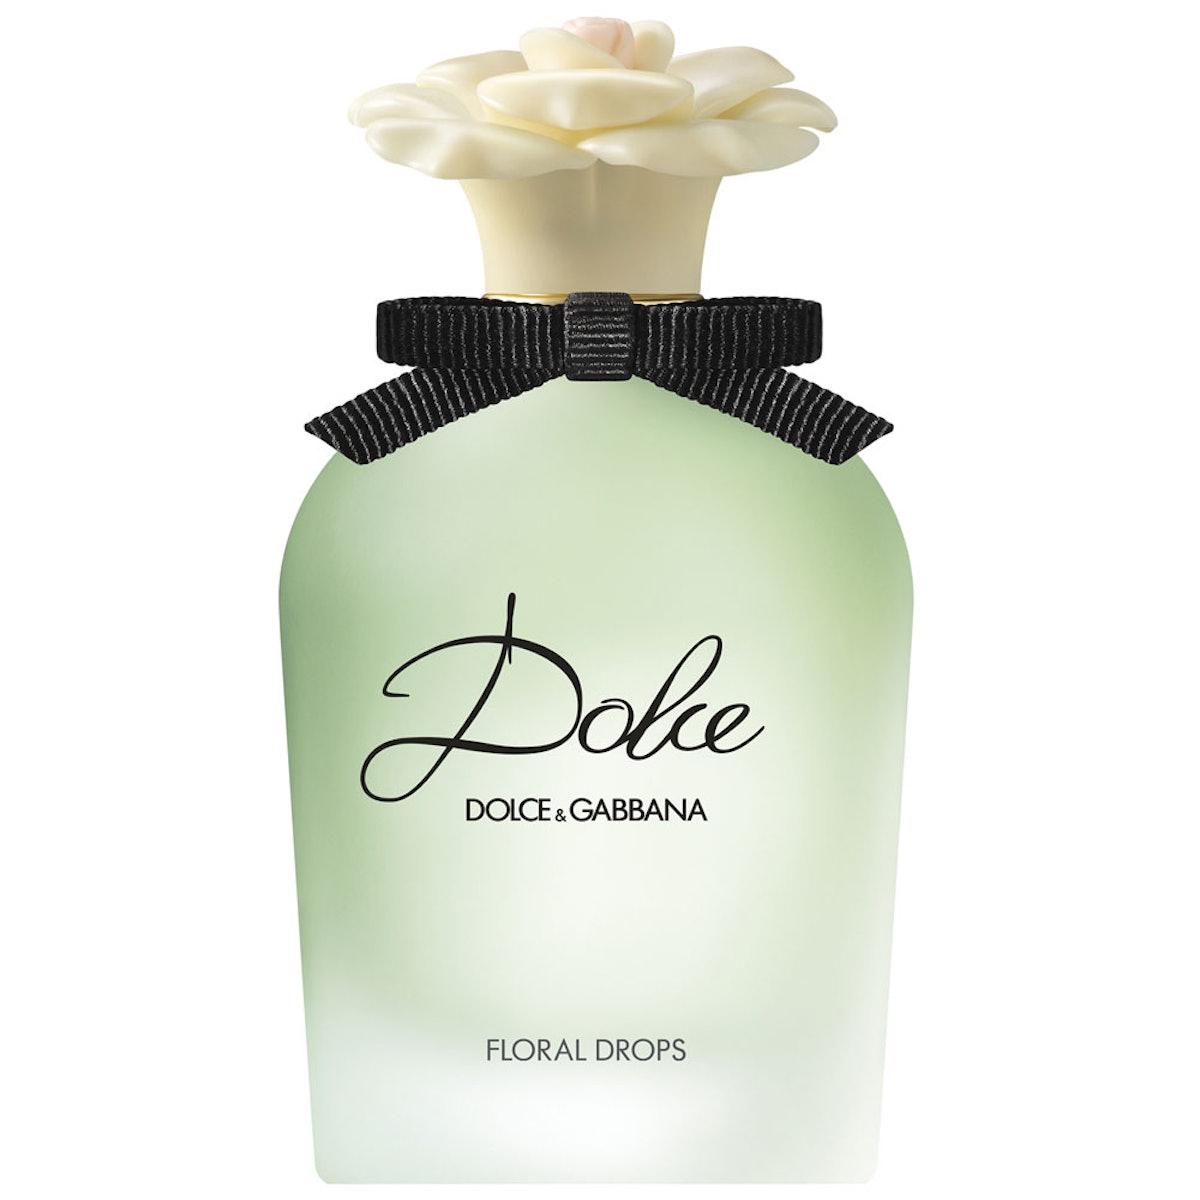 Dolce & Gabbana Dolce Floral Drop